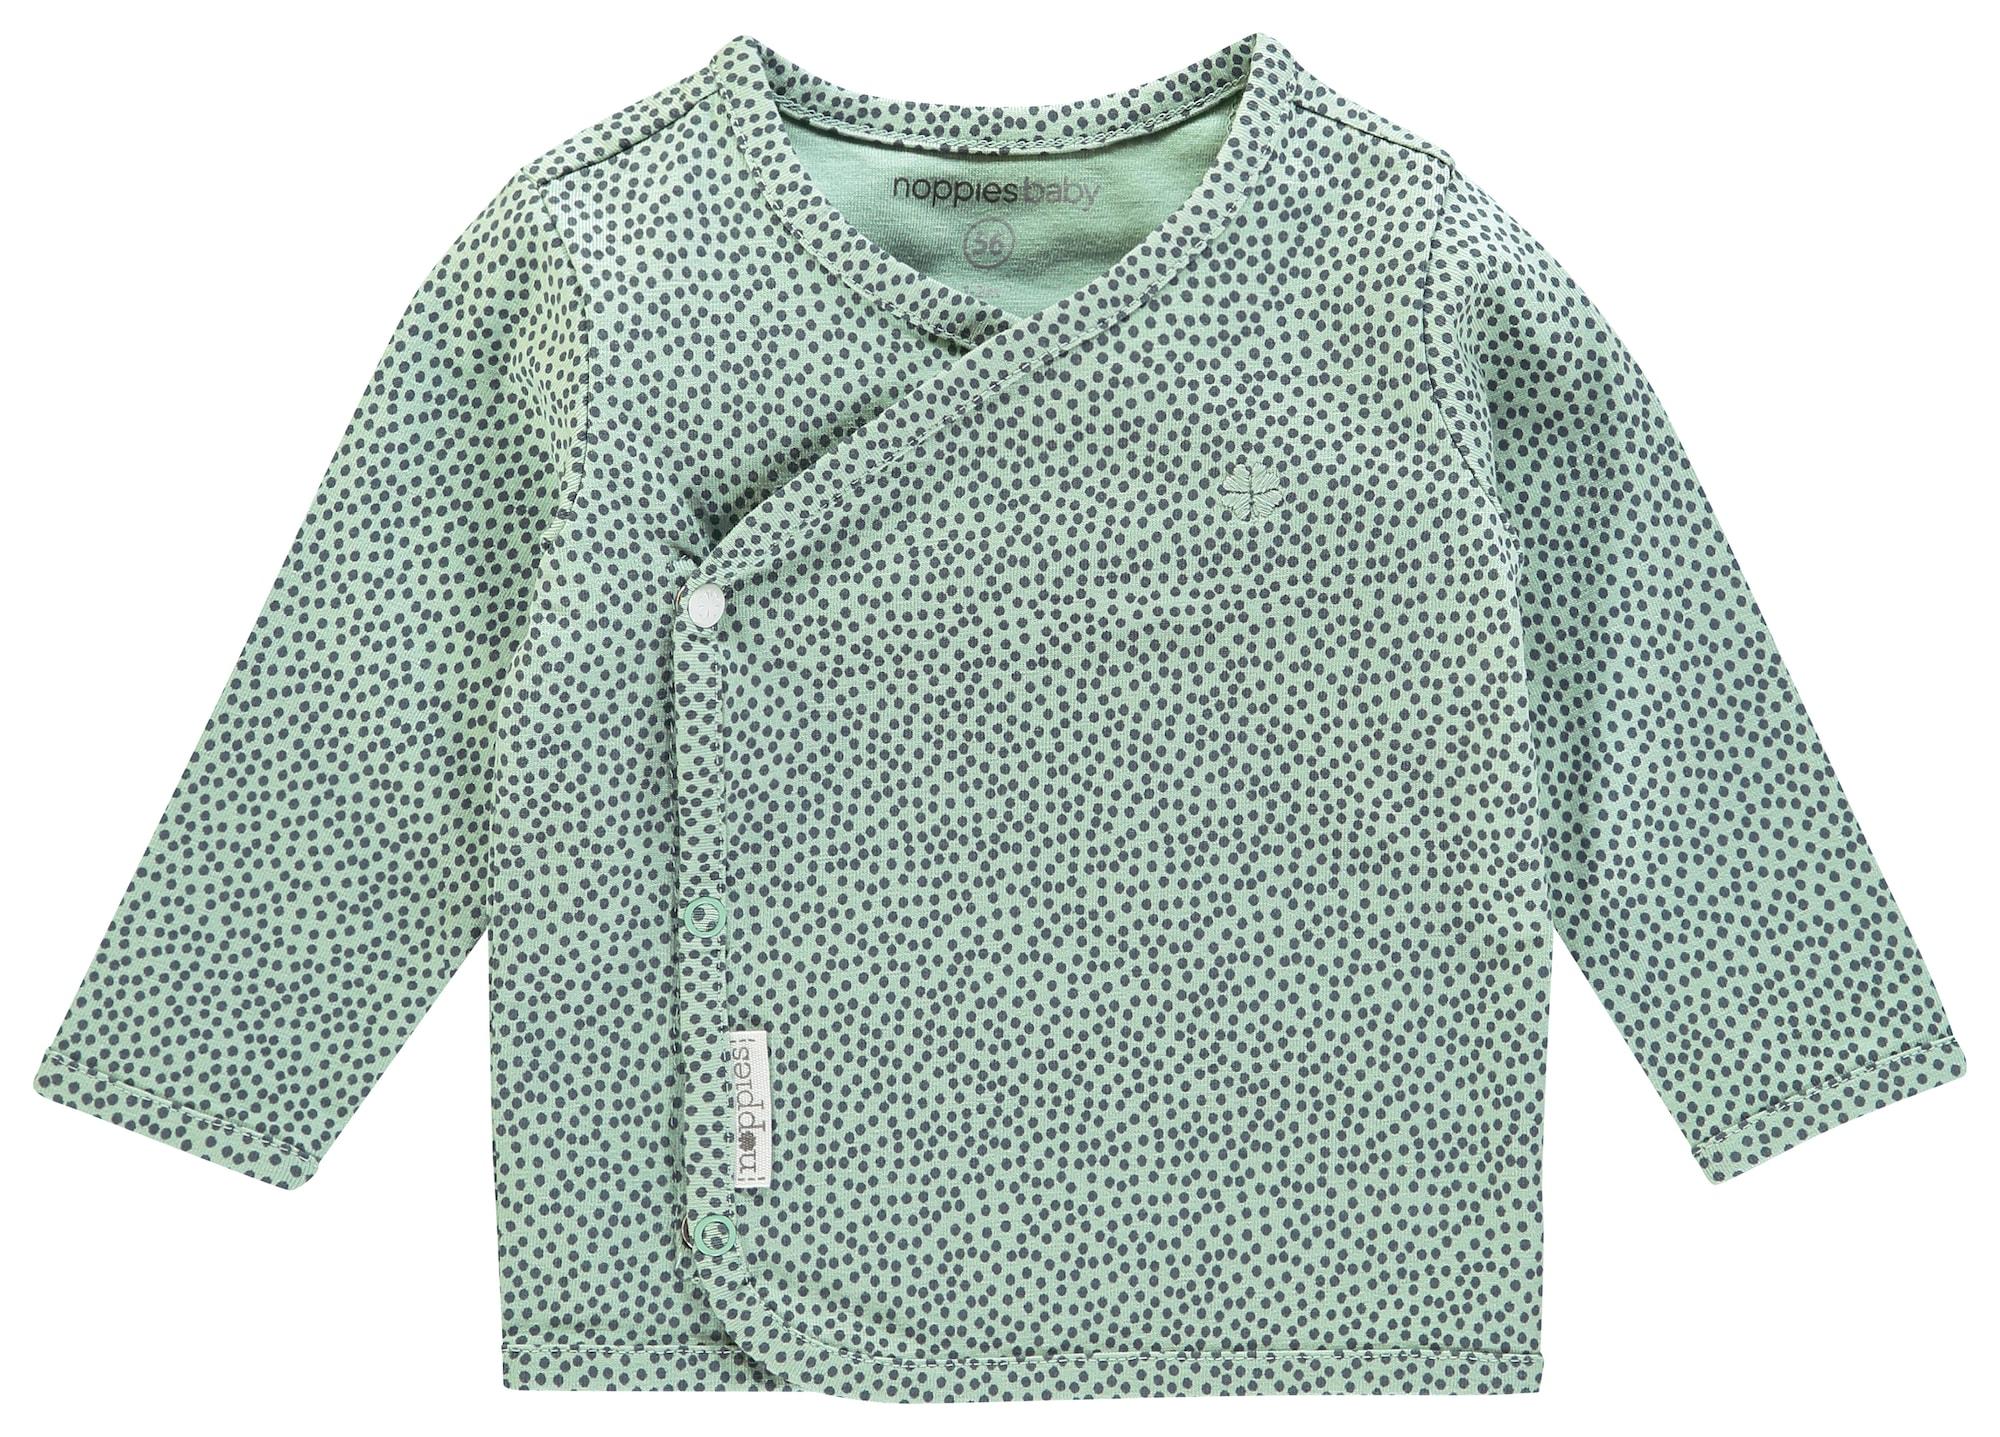 Noppies Tričko 'Hannah'  tmavě zelená / mátová